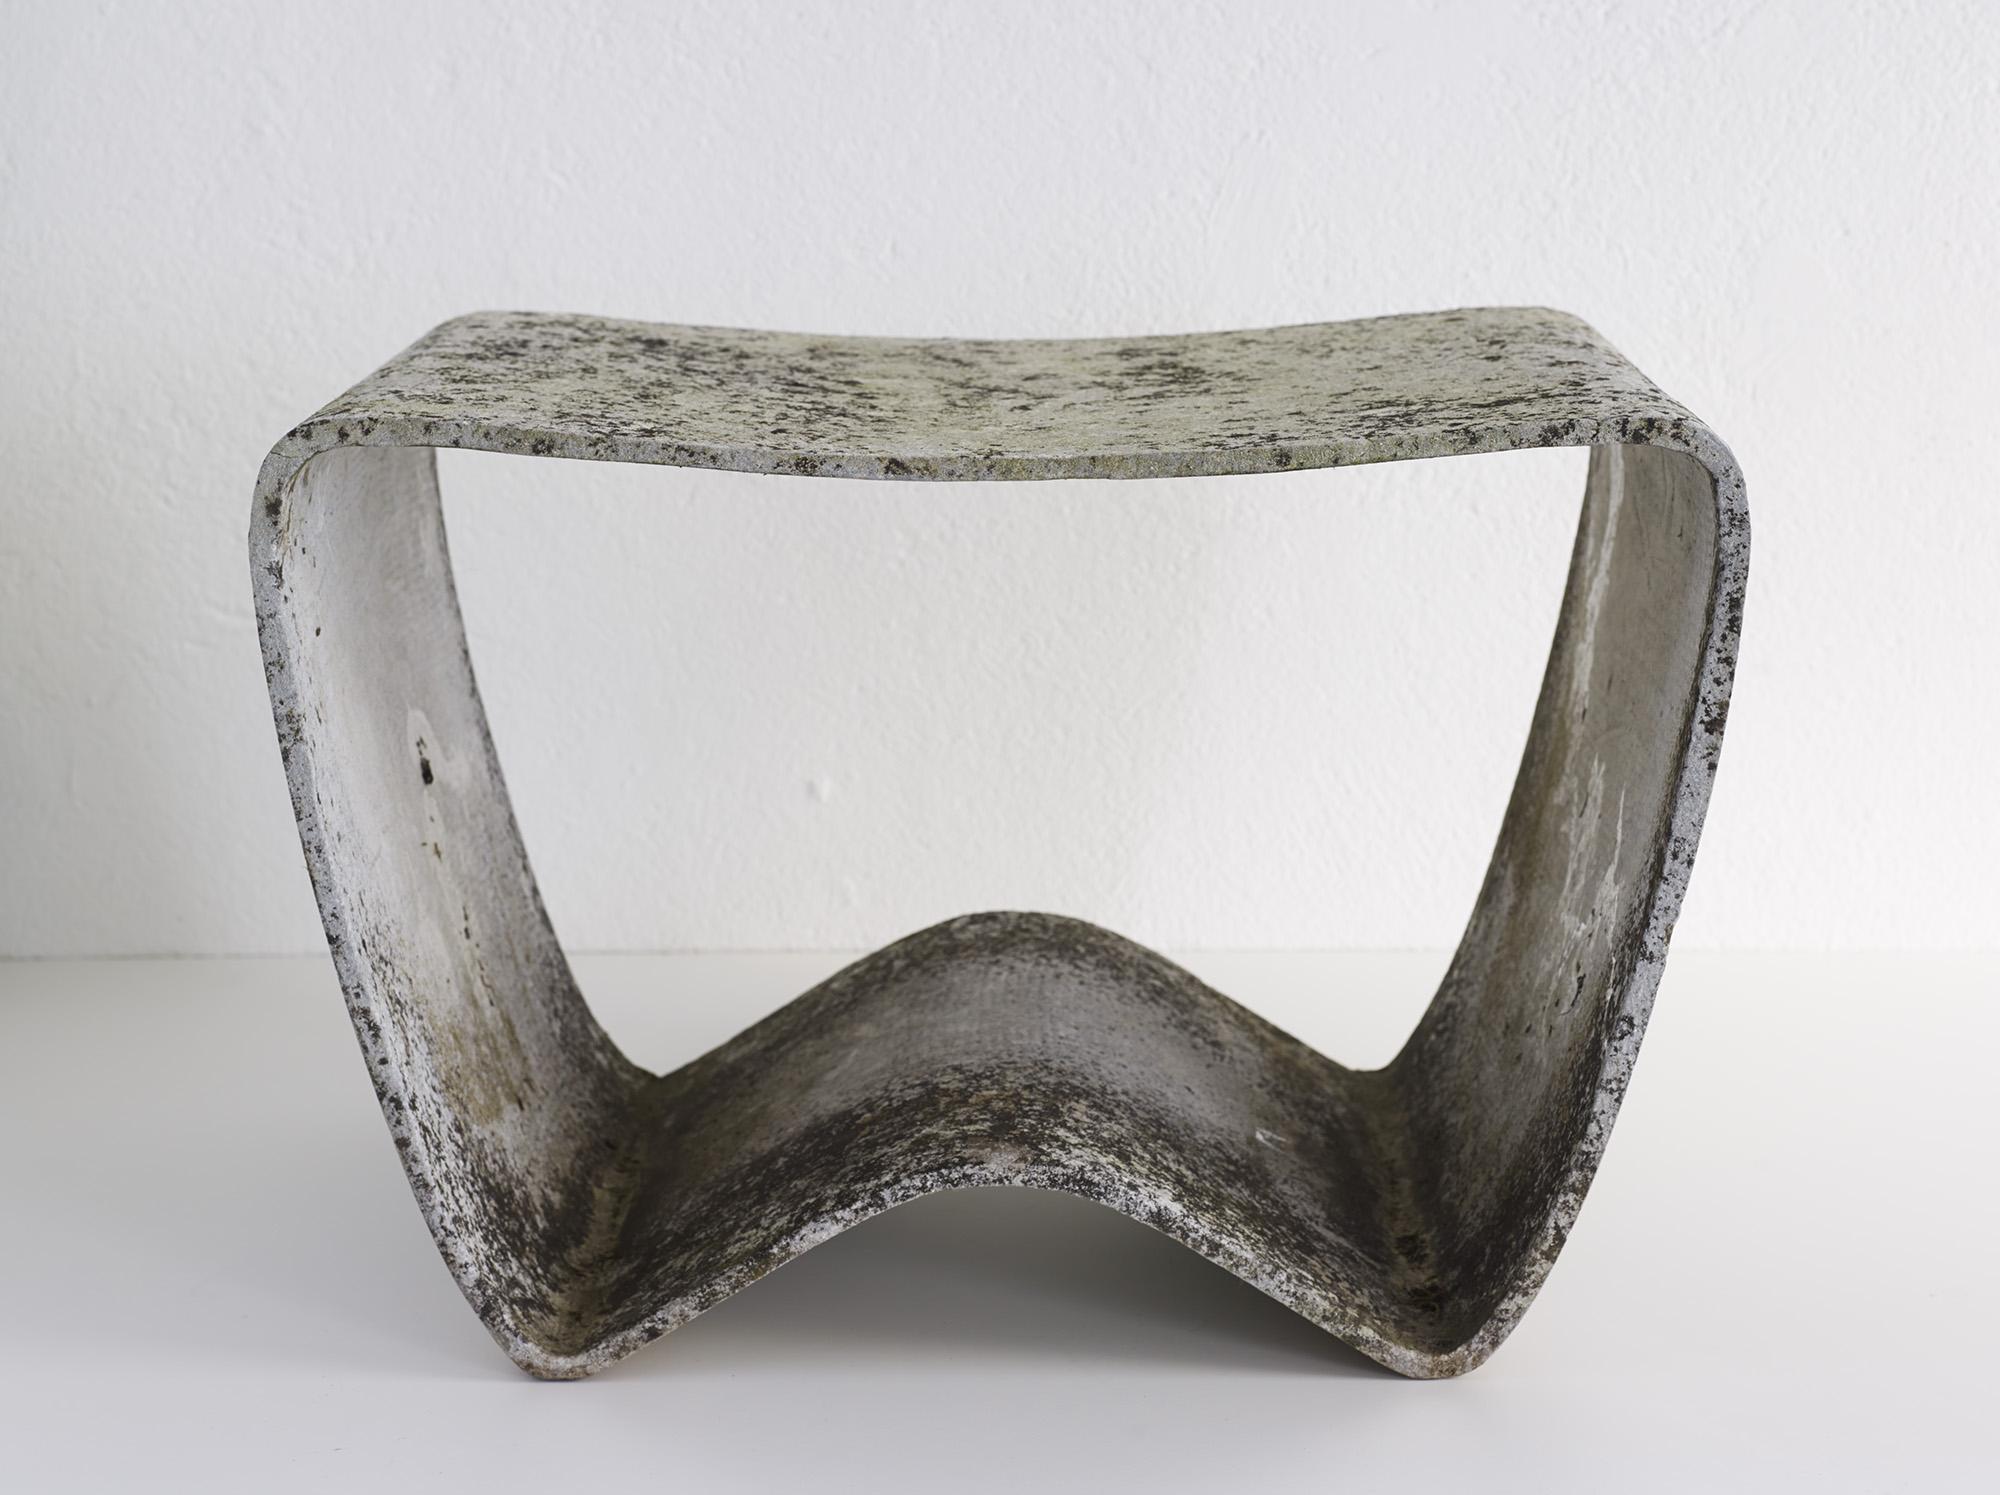 rare-stool-g59-11-by-ludwig-walser-image-08